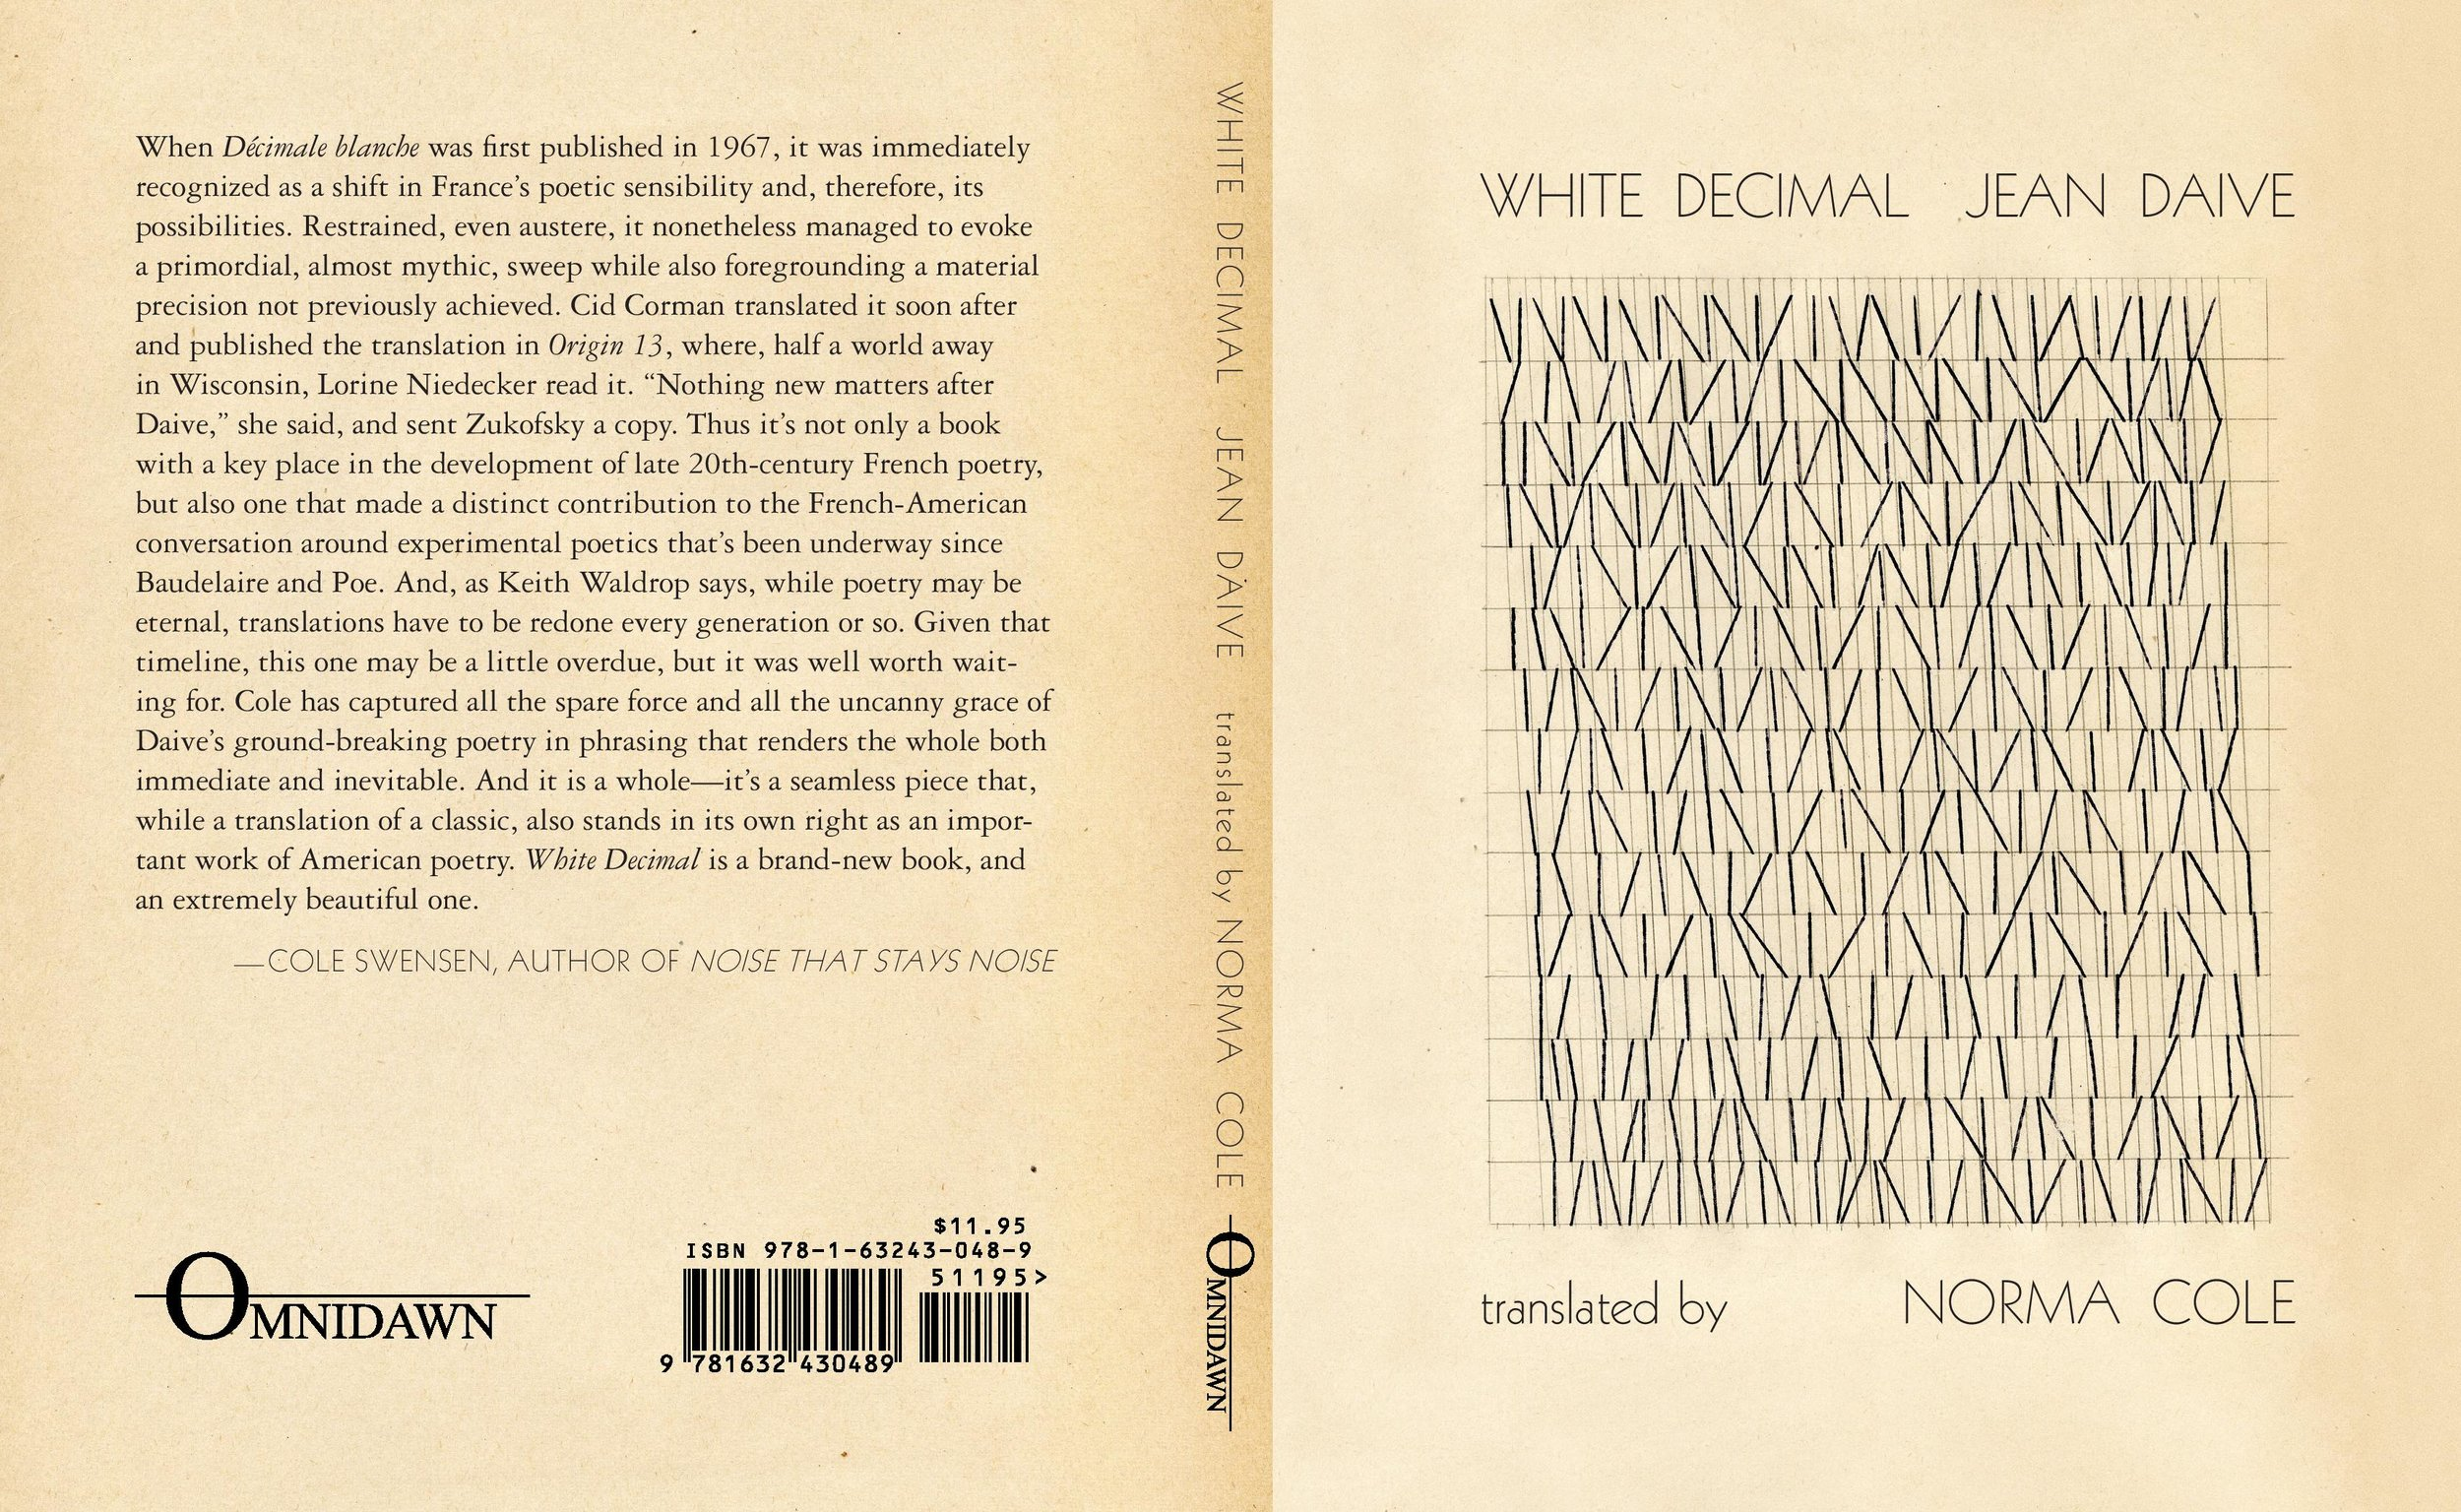 2017-04-19 White Decimal cover-GH draft 3-2-page-001.jpg